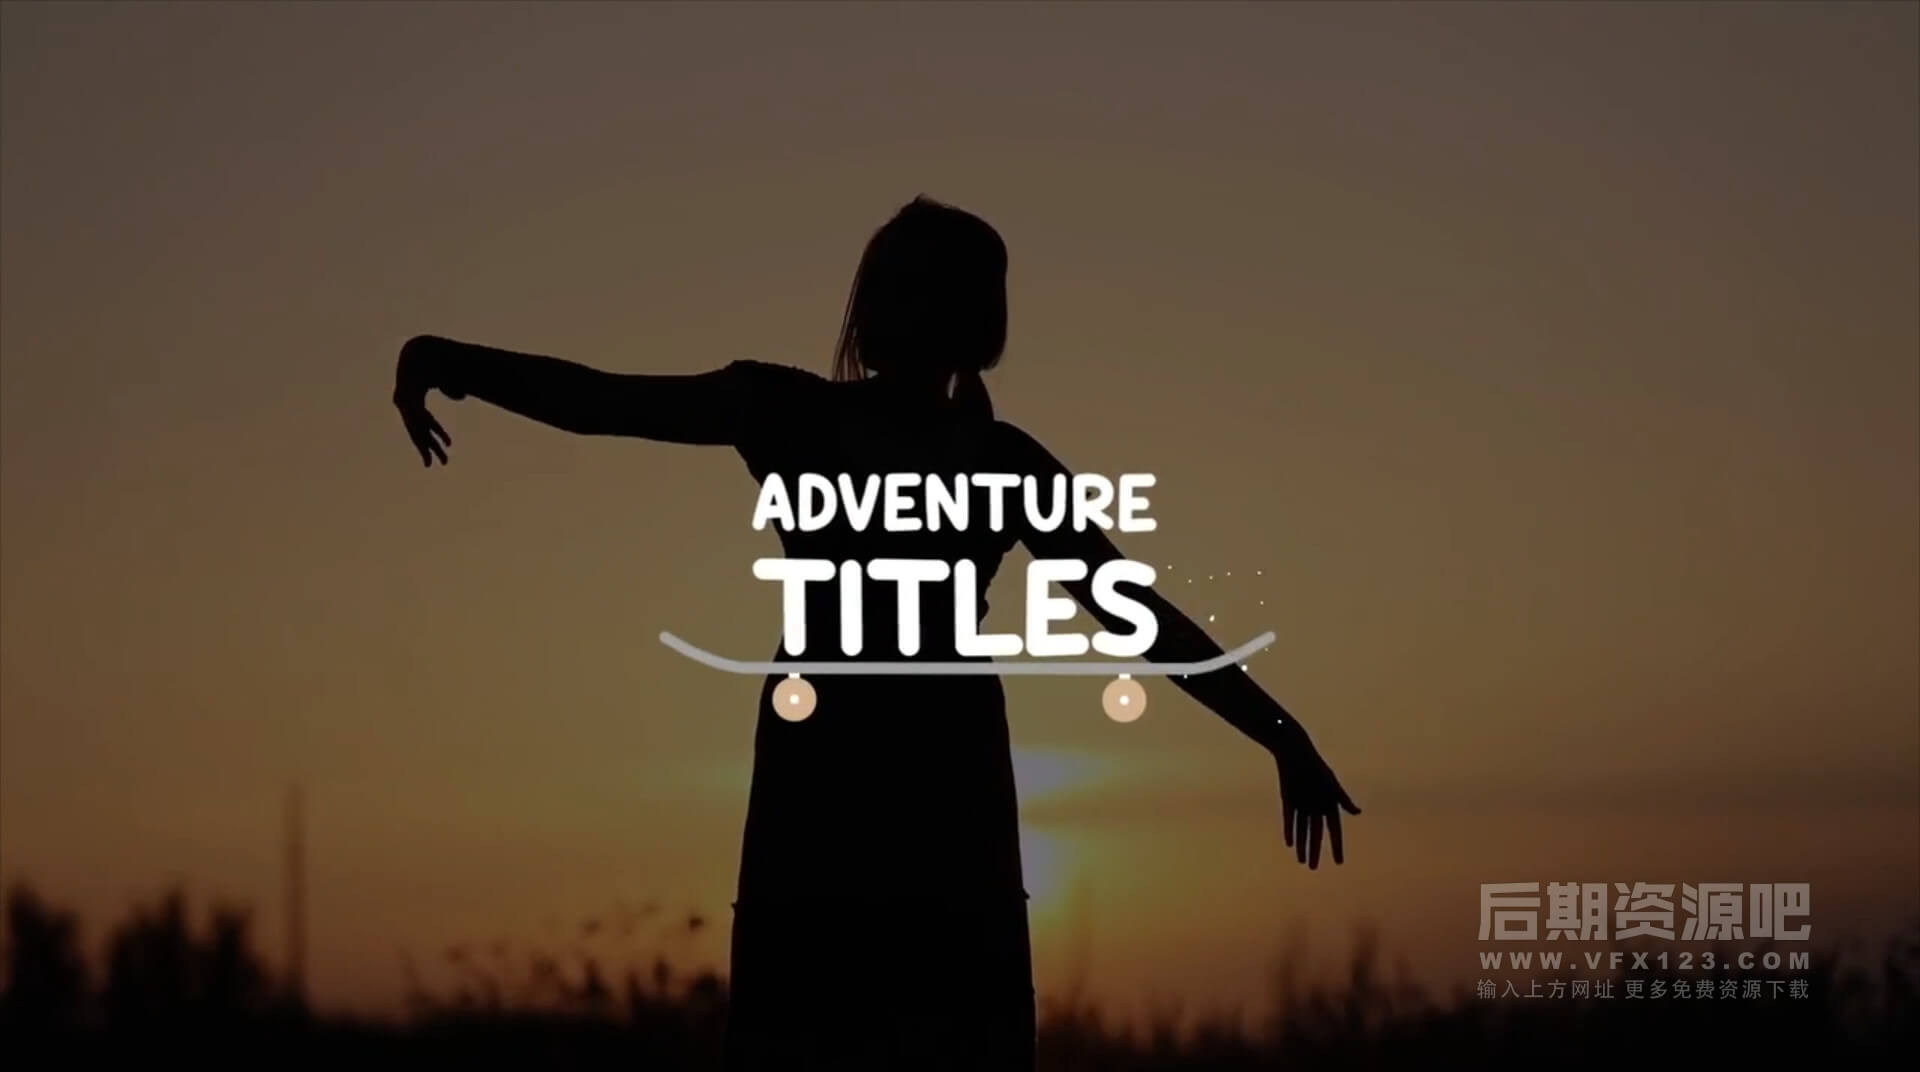 FCPX标题插件 10组卡通有趣活力片头字幕展示+转场  Adventure Titles